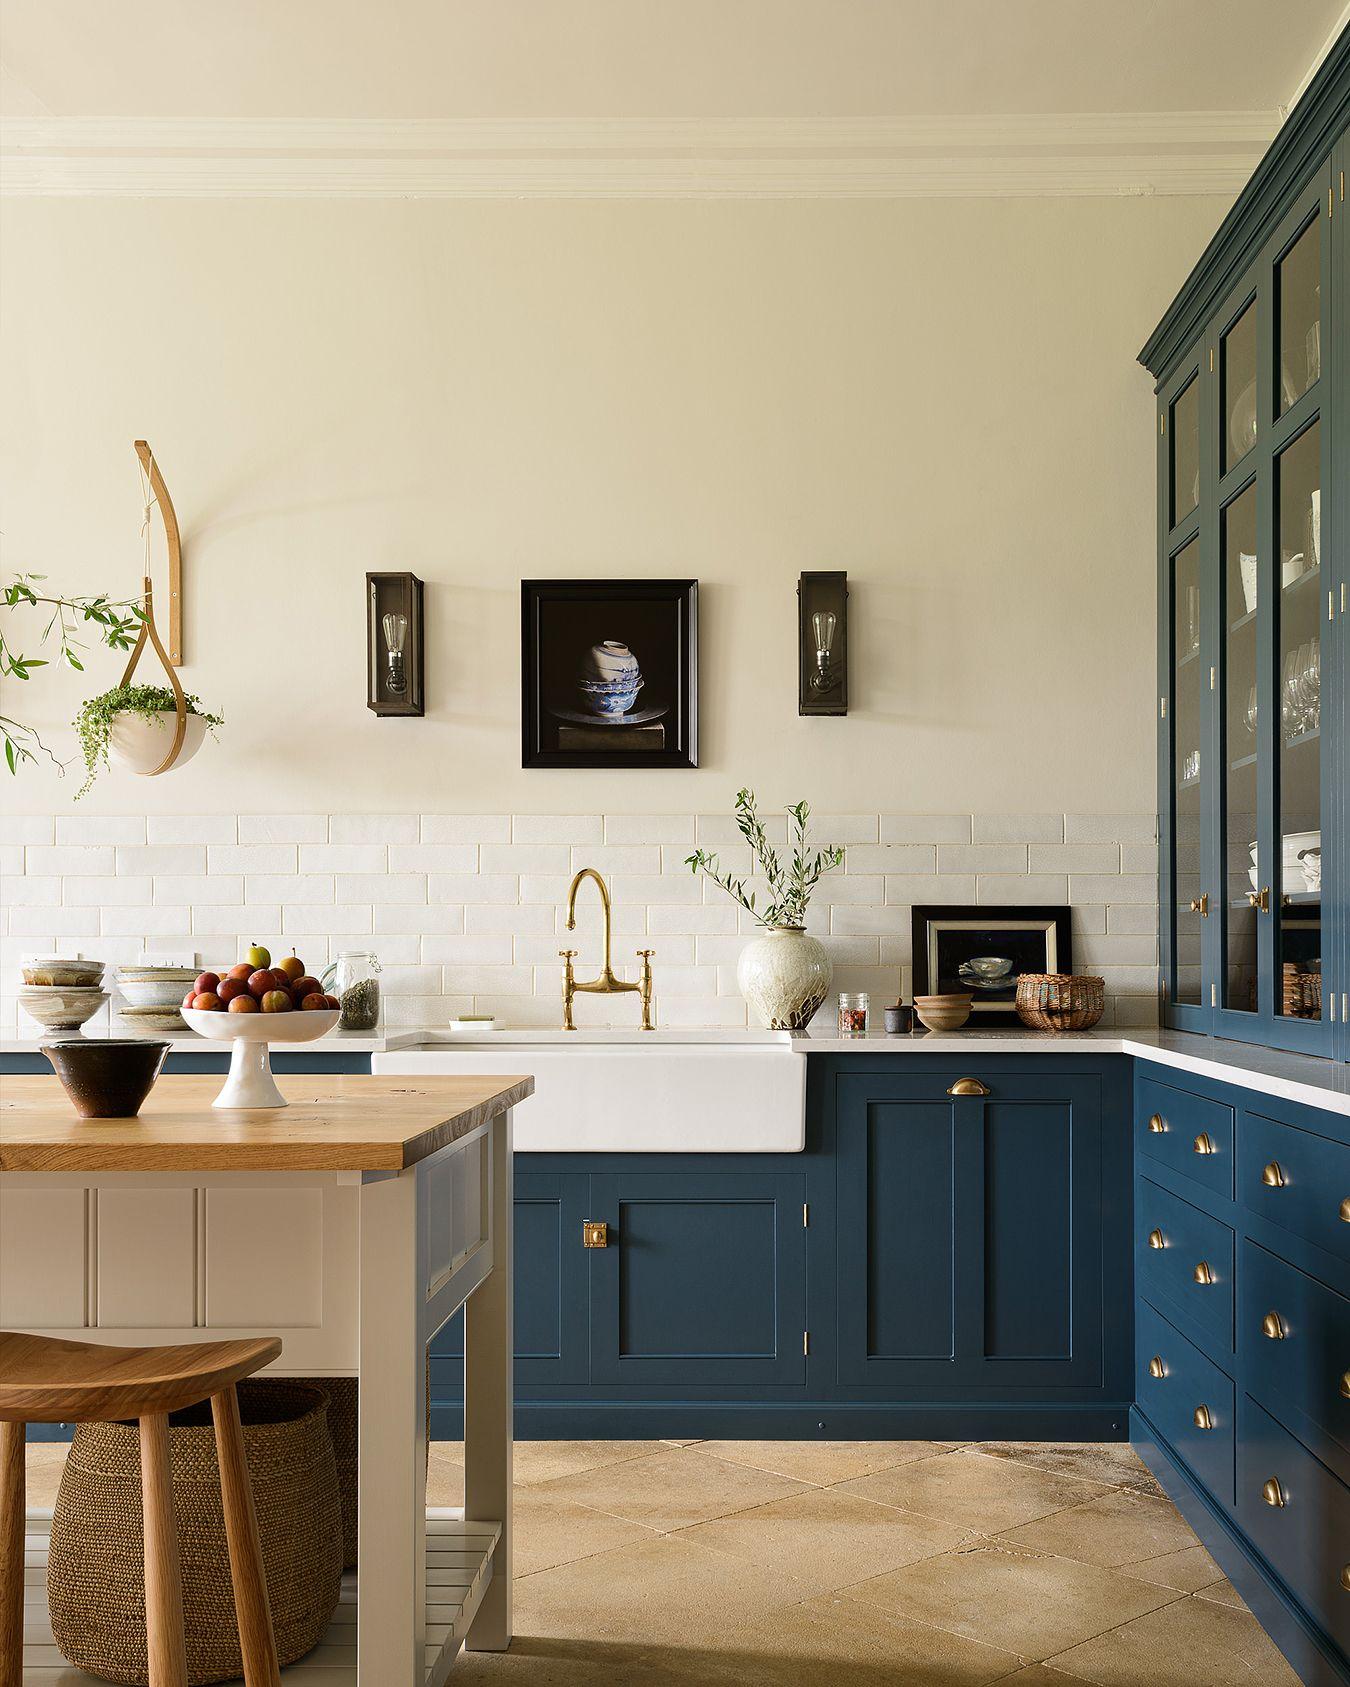 bespoke kitchens by devol classic georgian style english kitchens devol kitchens on kitchen interior classic id=15310